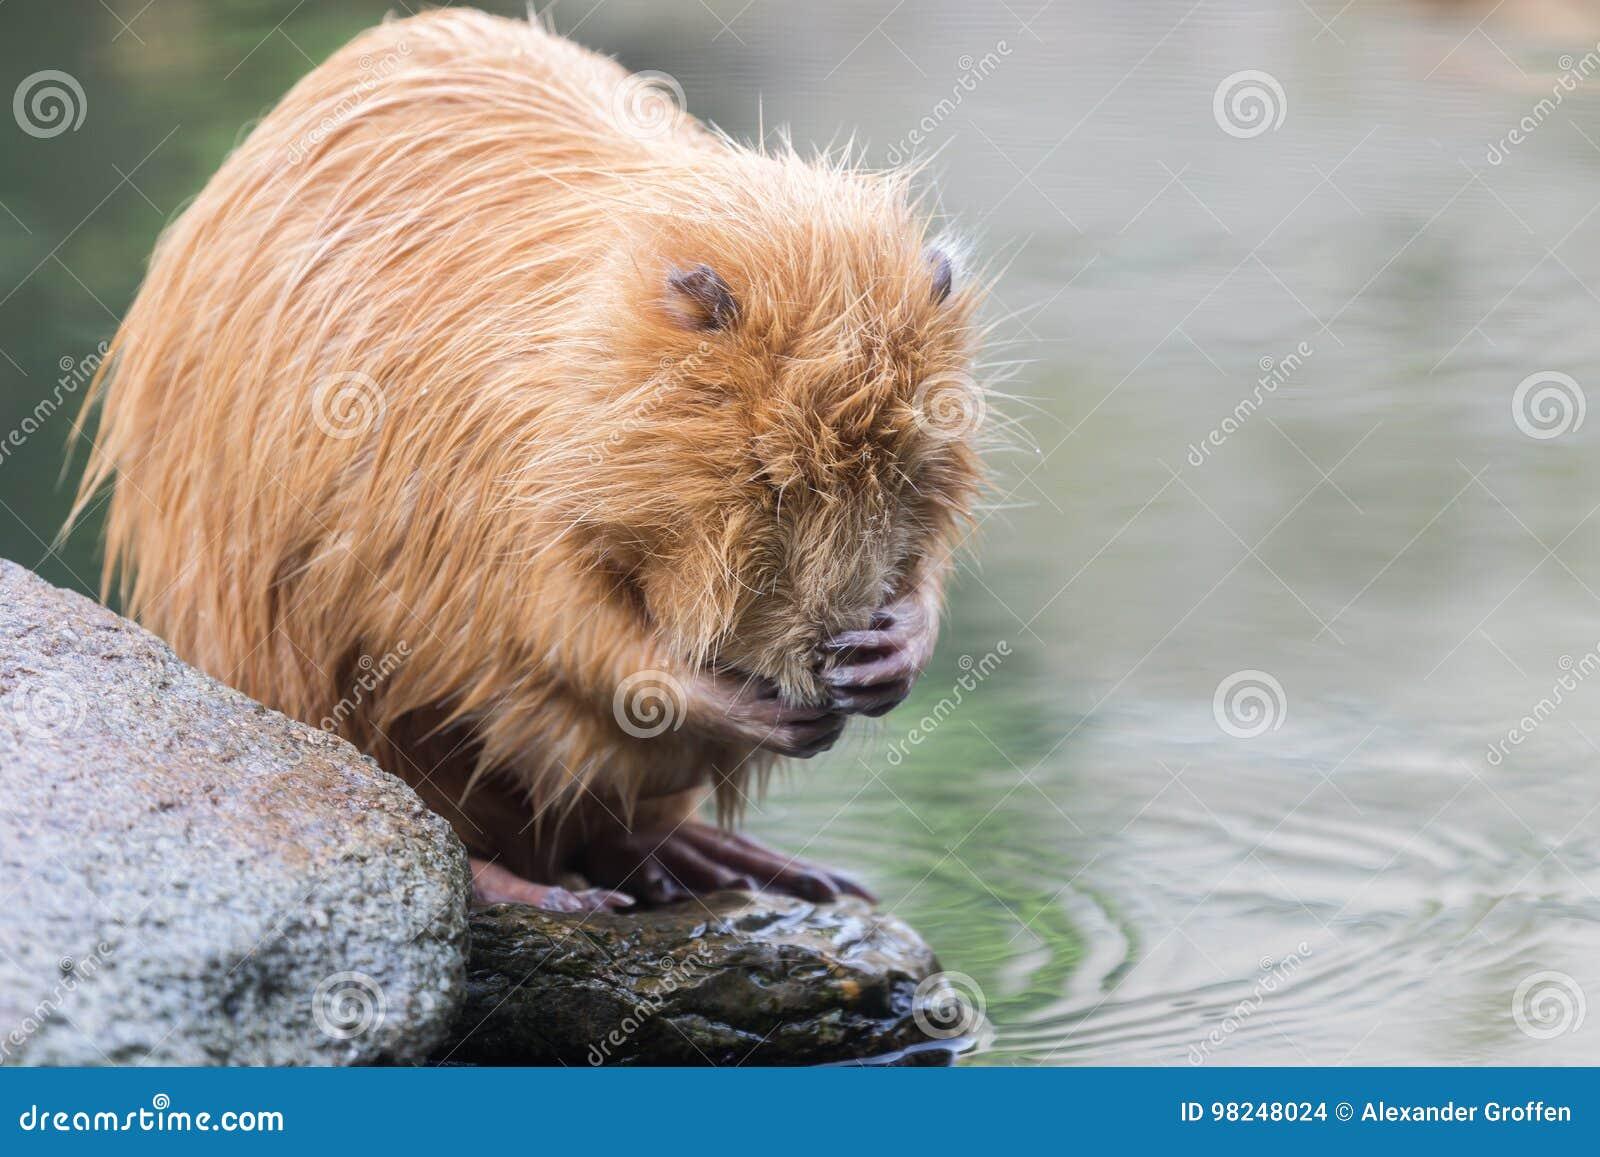 Nutria (Myocastor coypus or beaver rat) washing face